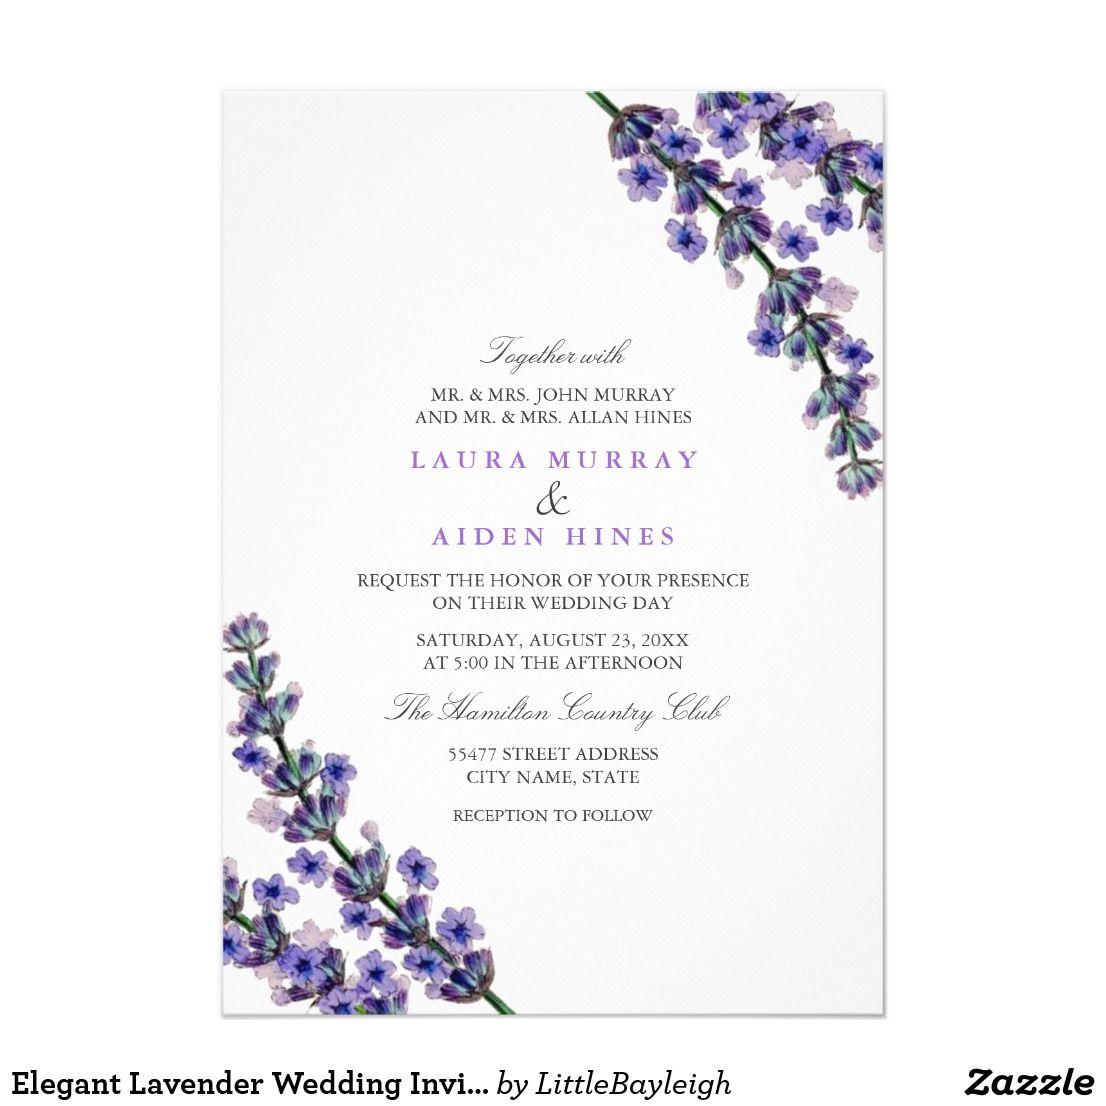 Elegant Lavender Wedding Invitation | Wedding Invitations ...